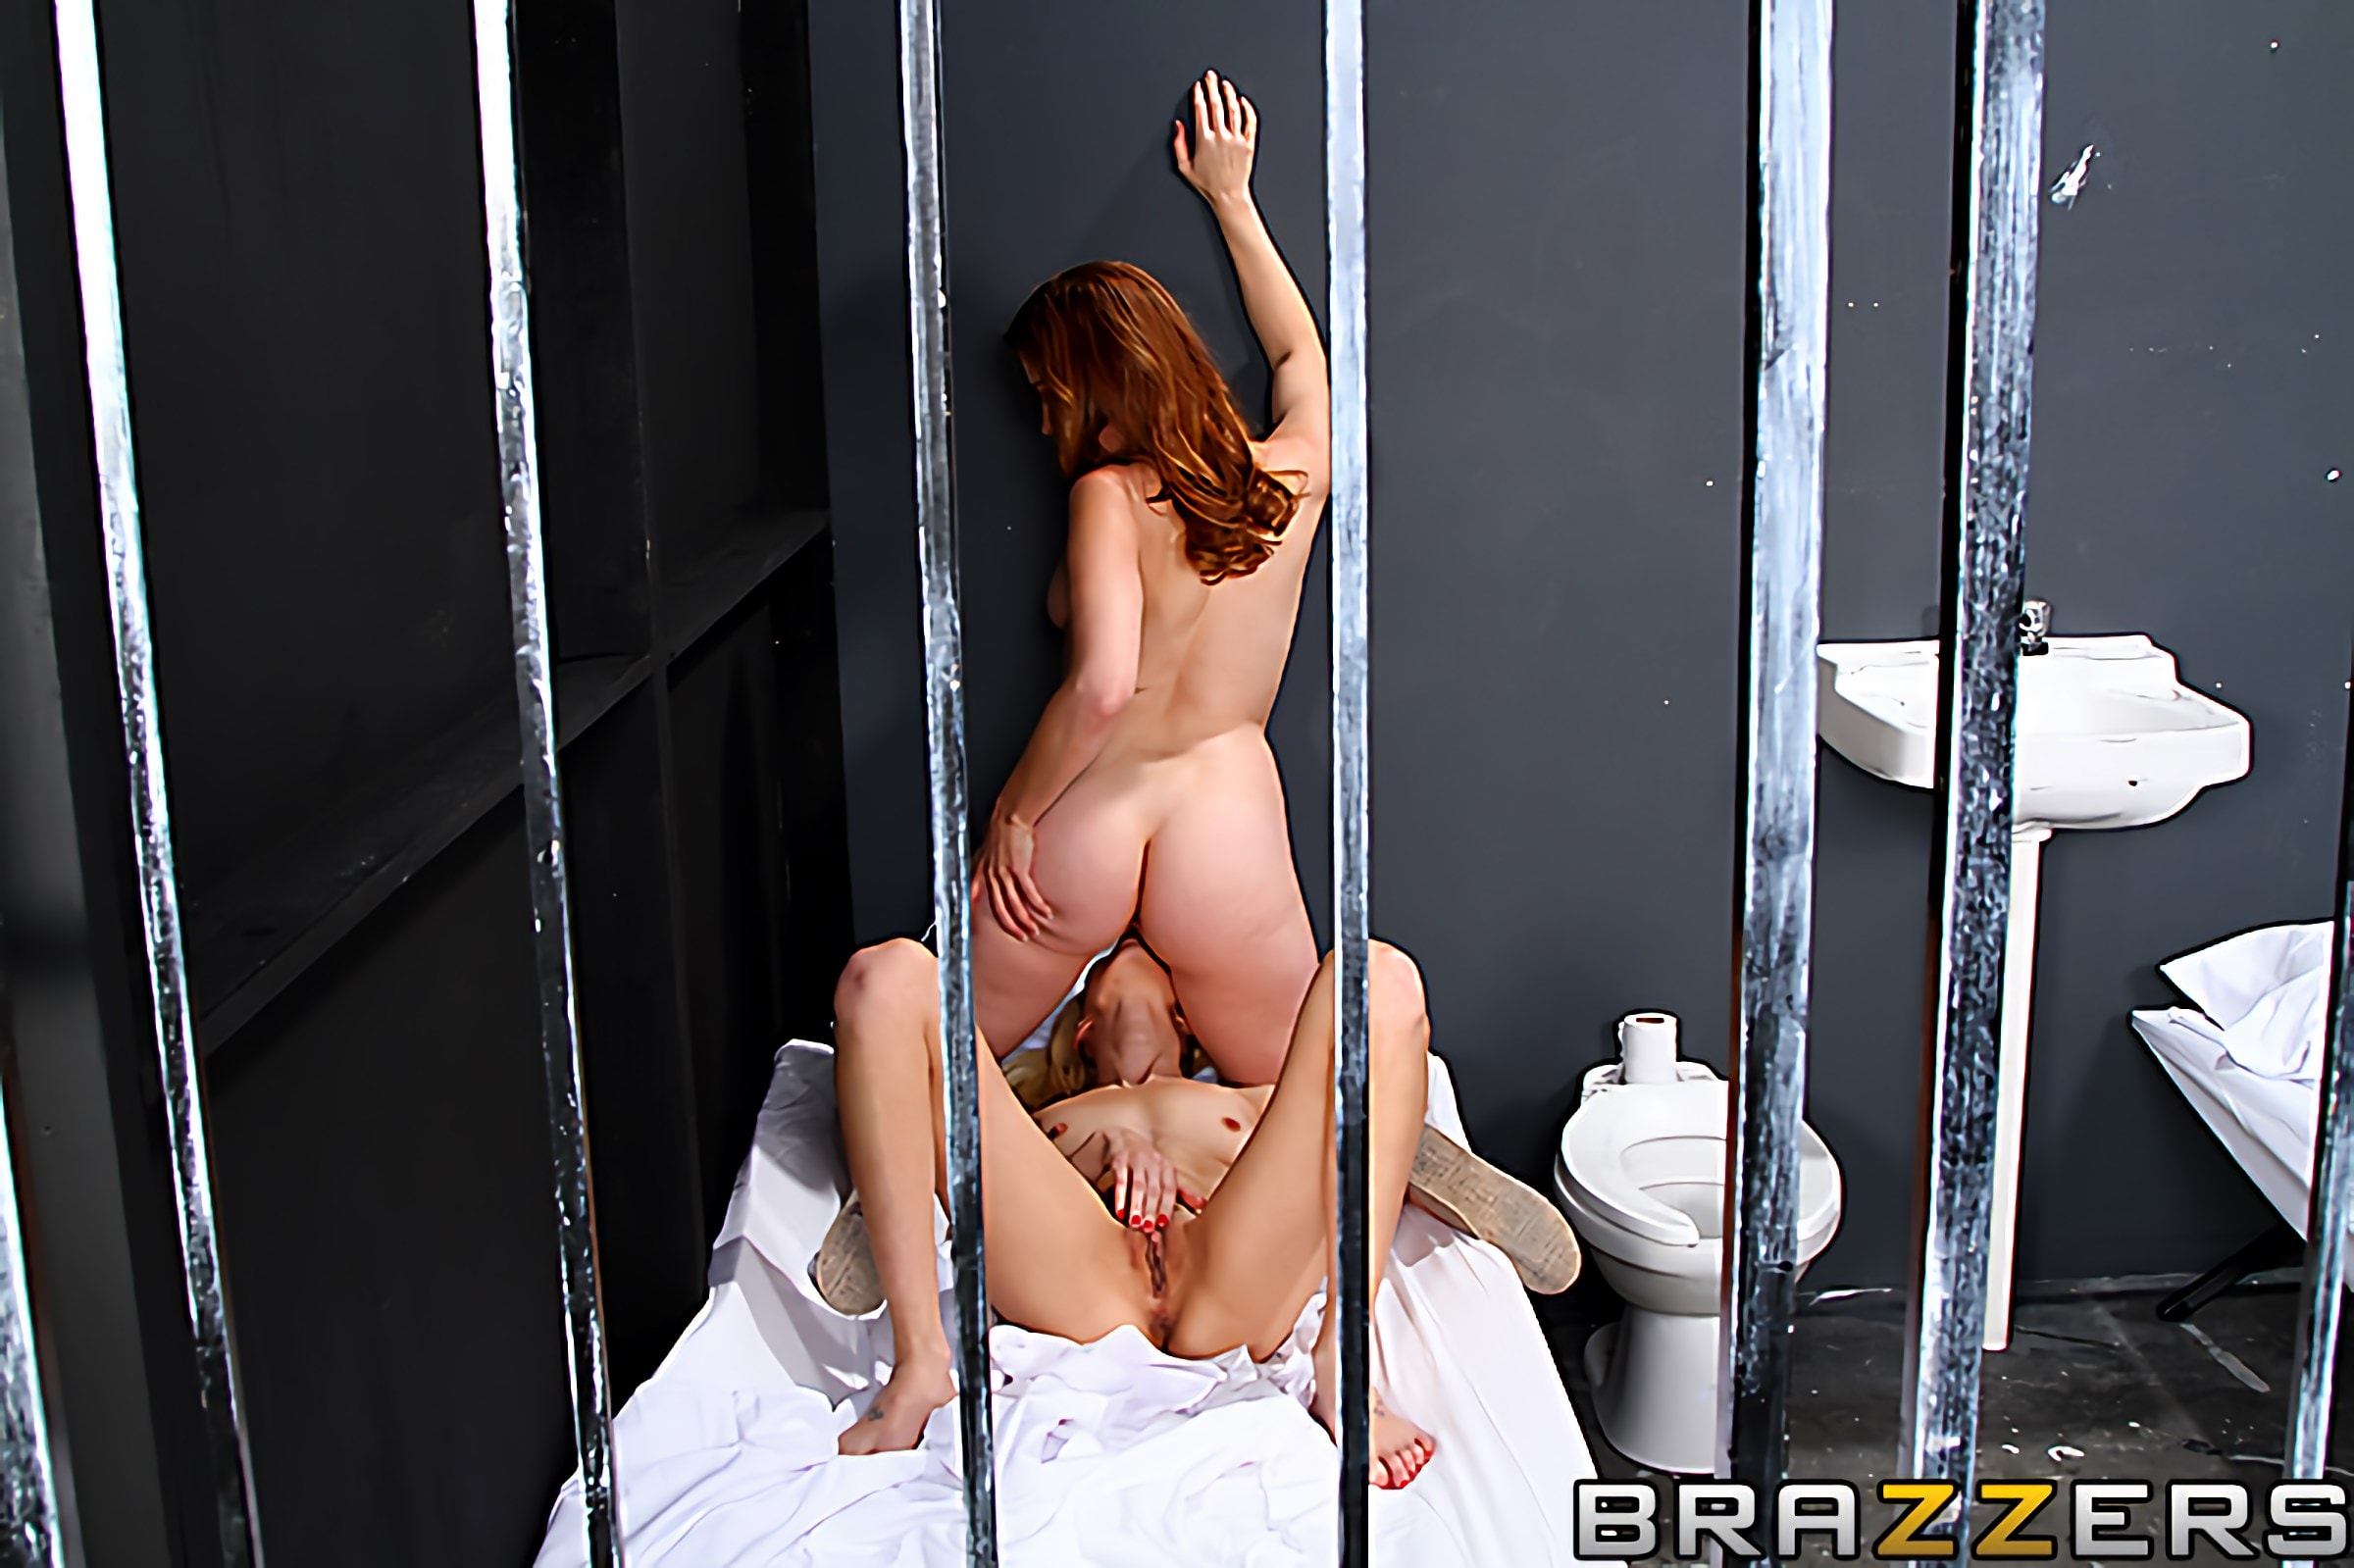 Brazzers 'Prison Pussy' starring Kiara Diane (Photo 4)